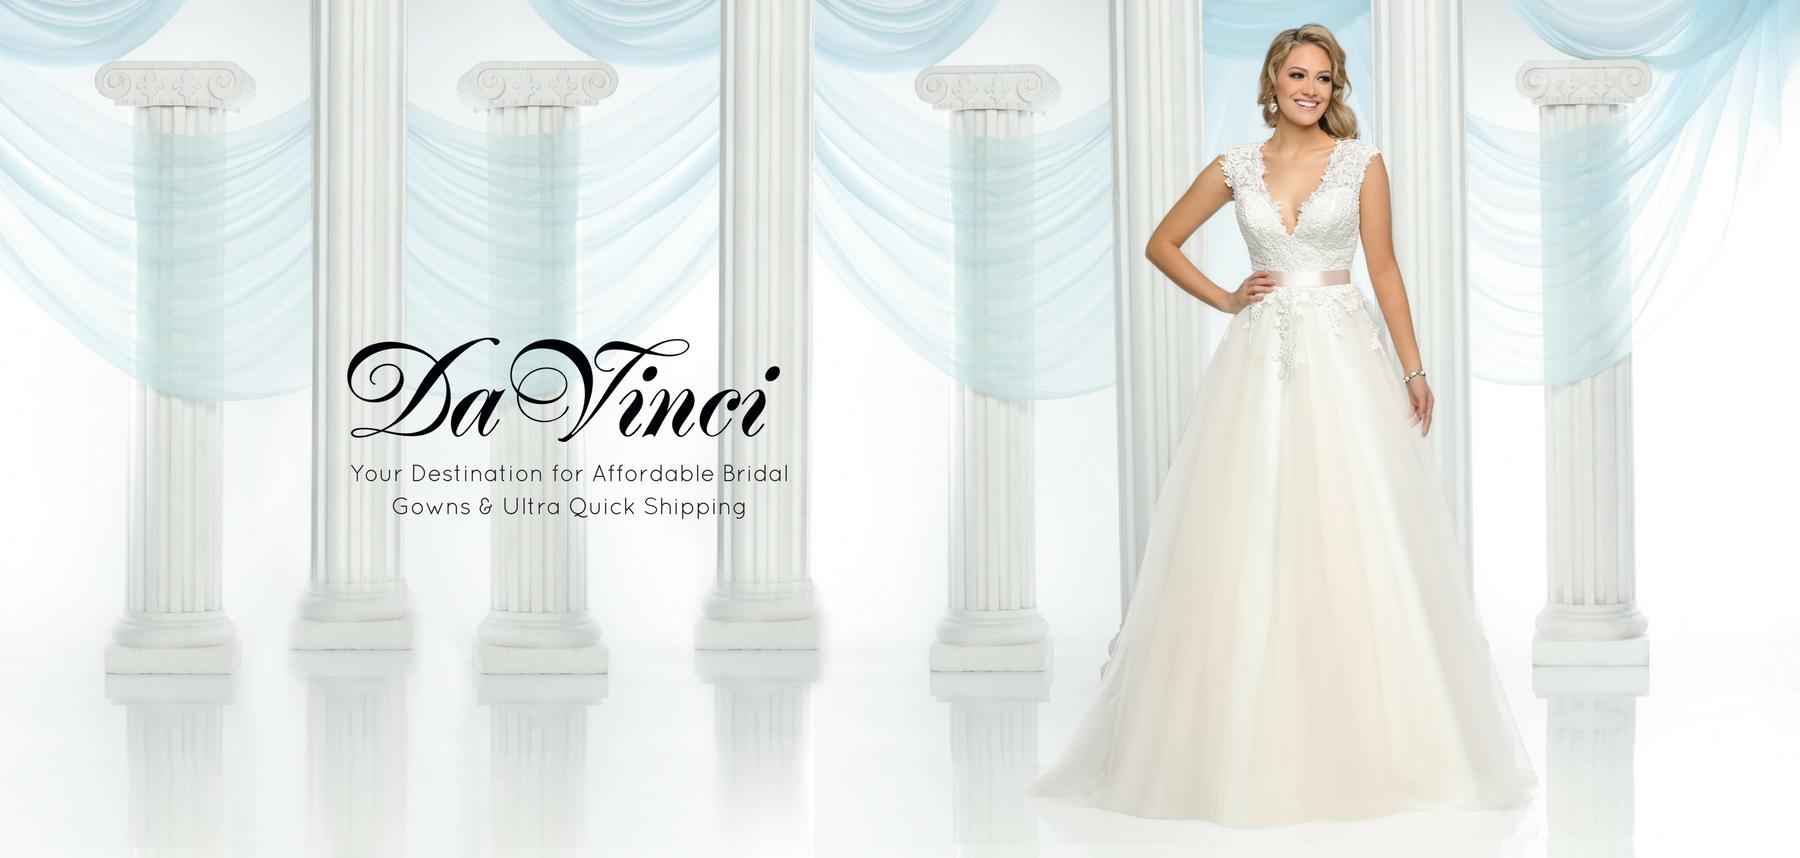 Wedding Bridesmaid Dresses DaVinci Bridal Collection